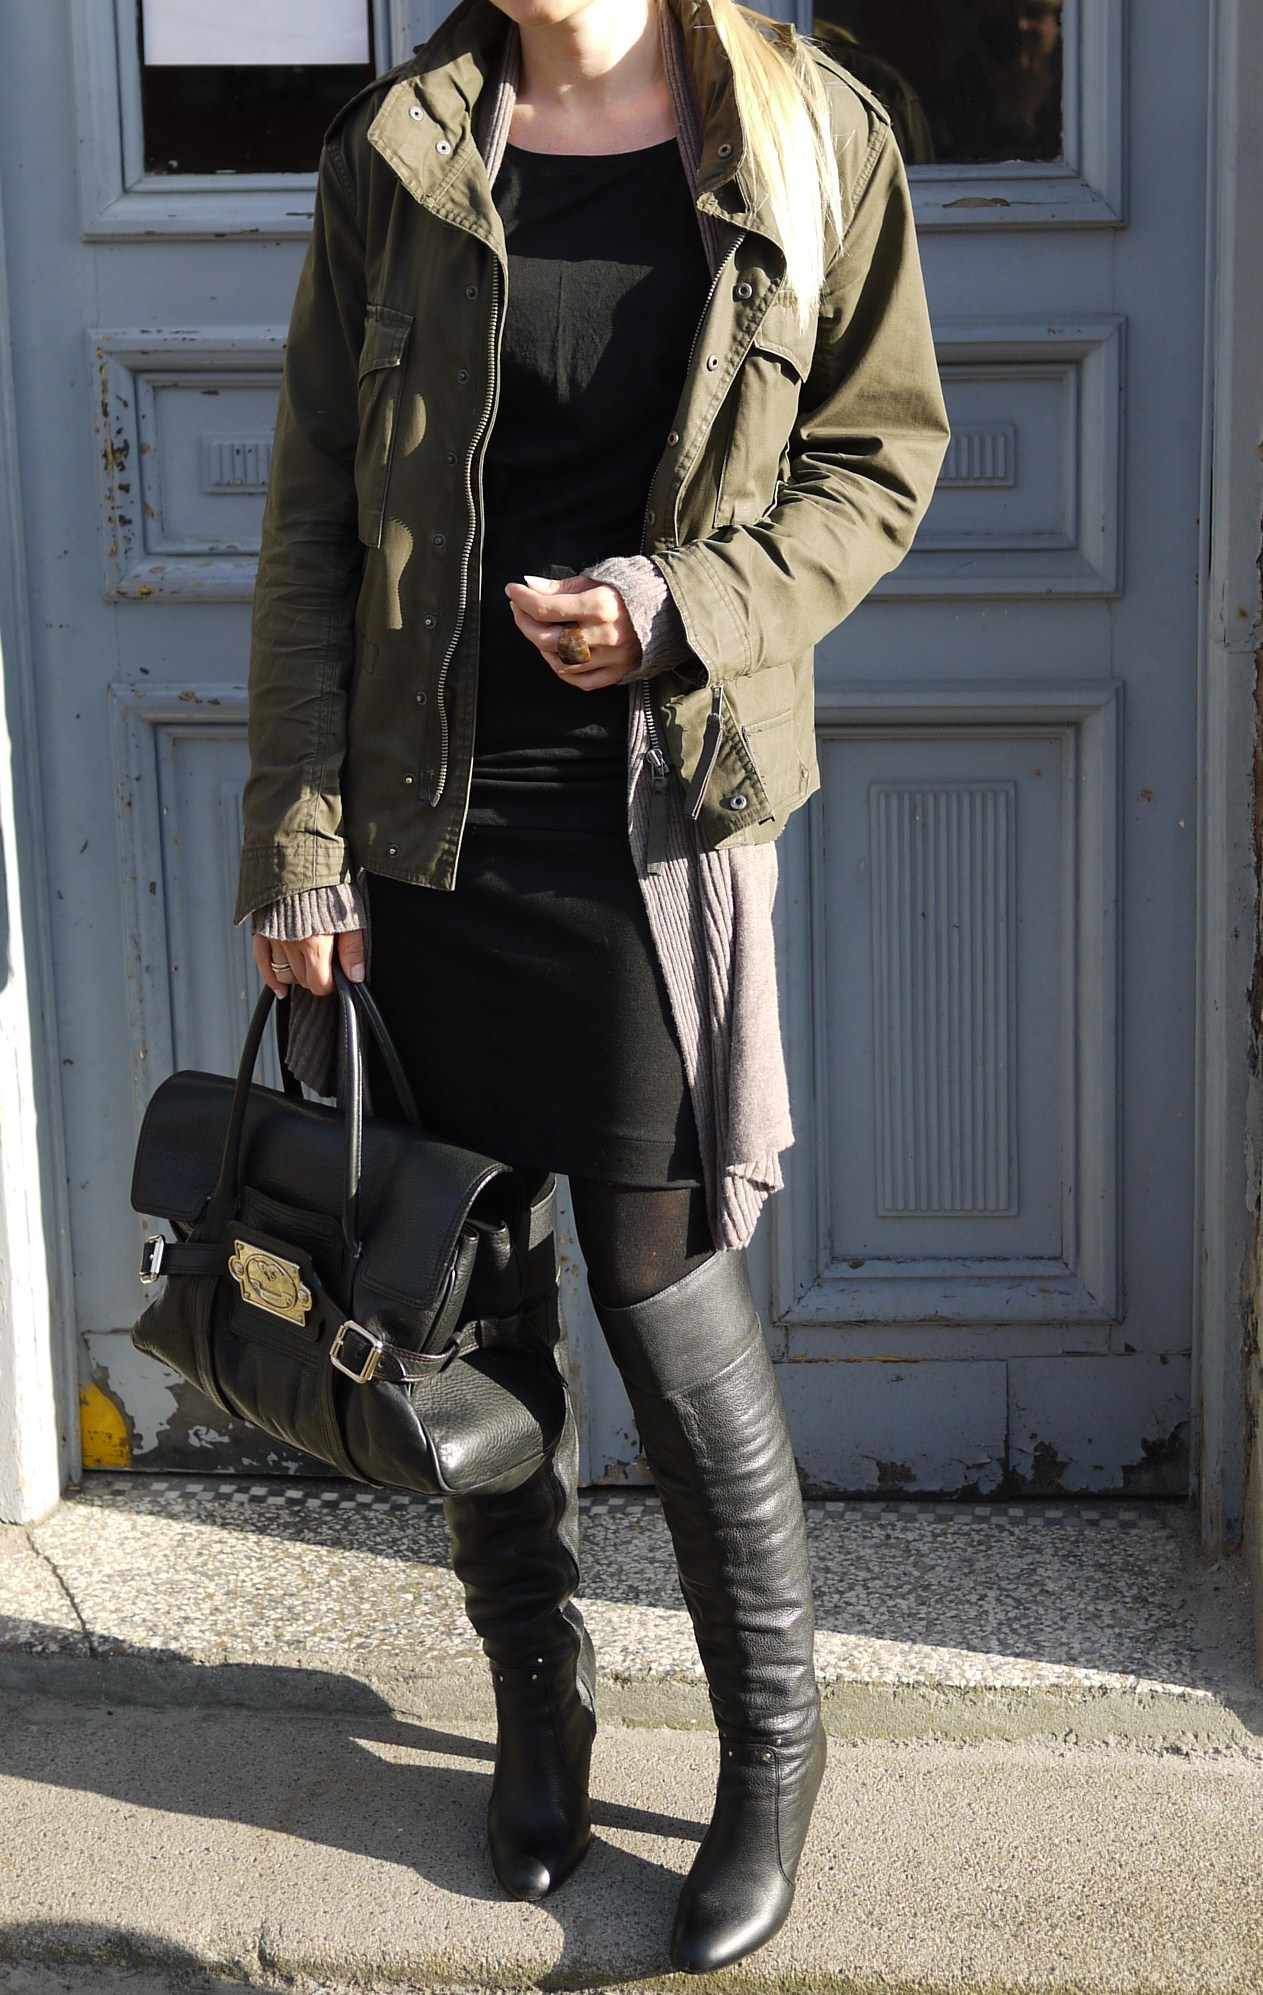 dress:h&m, overknees: vintage, armyjacket:my husbands and bag Luella